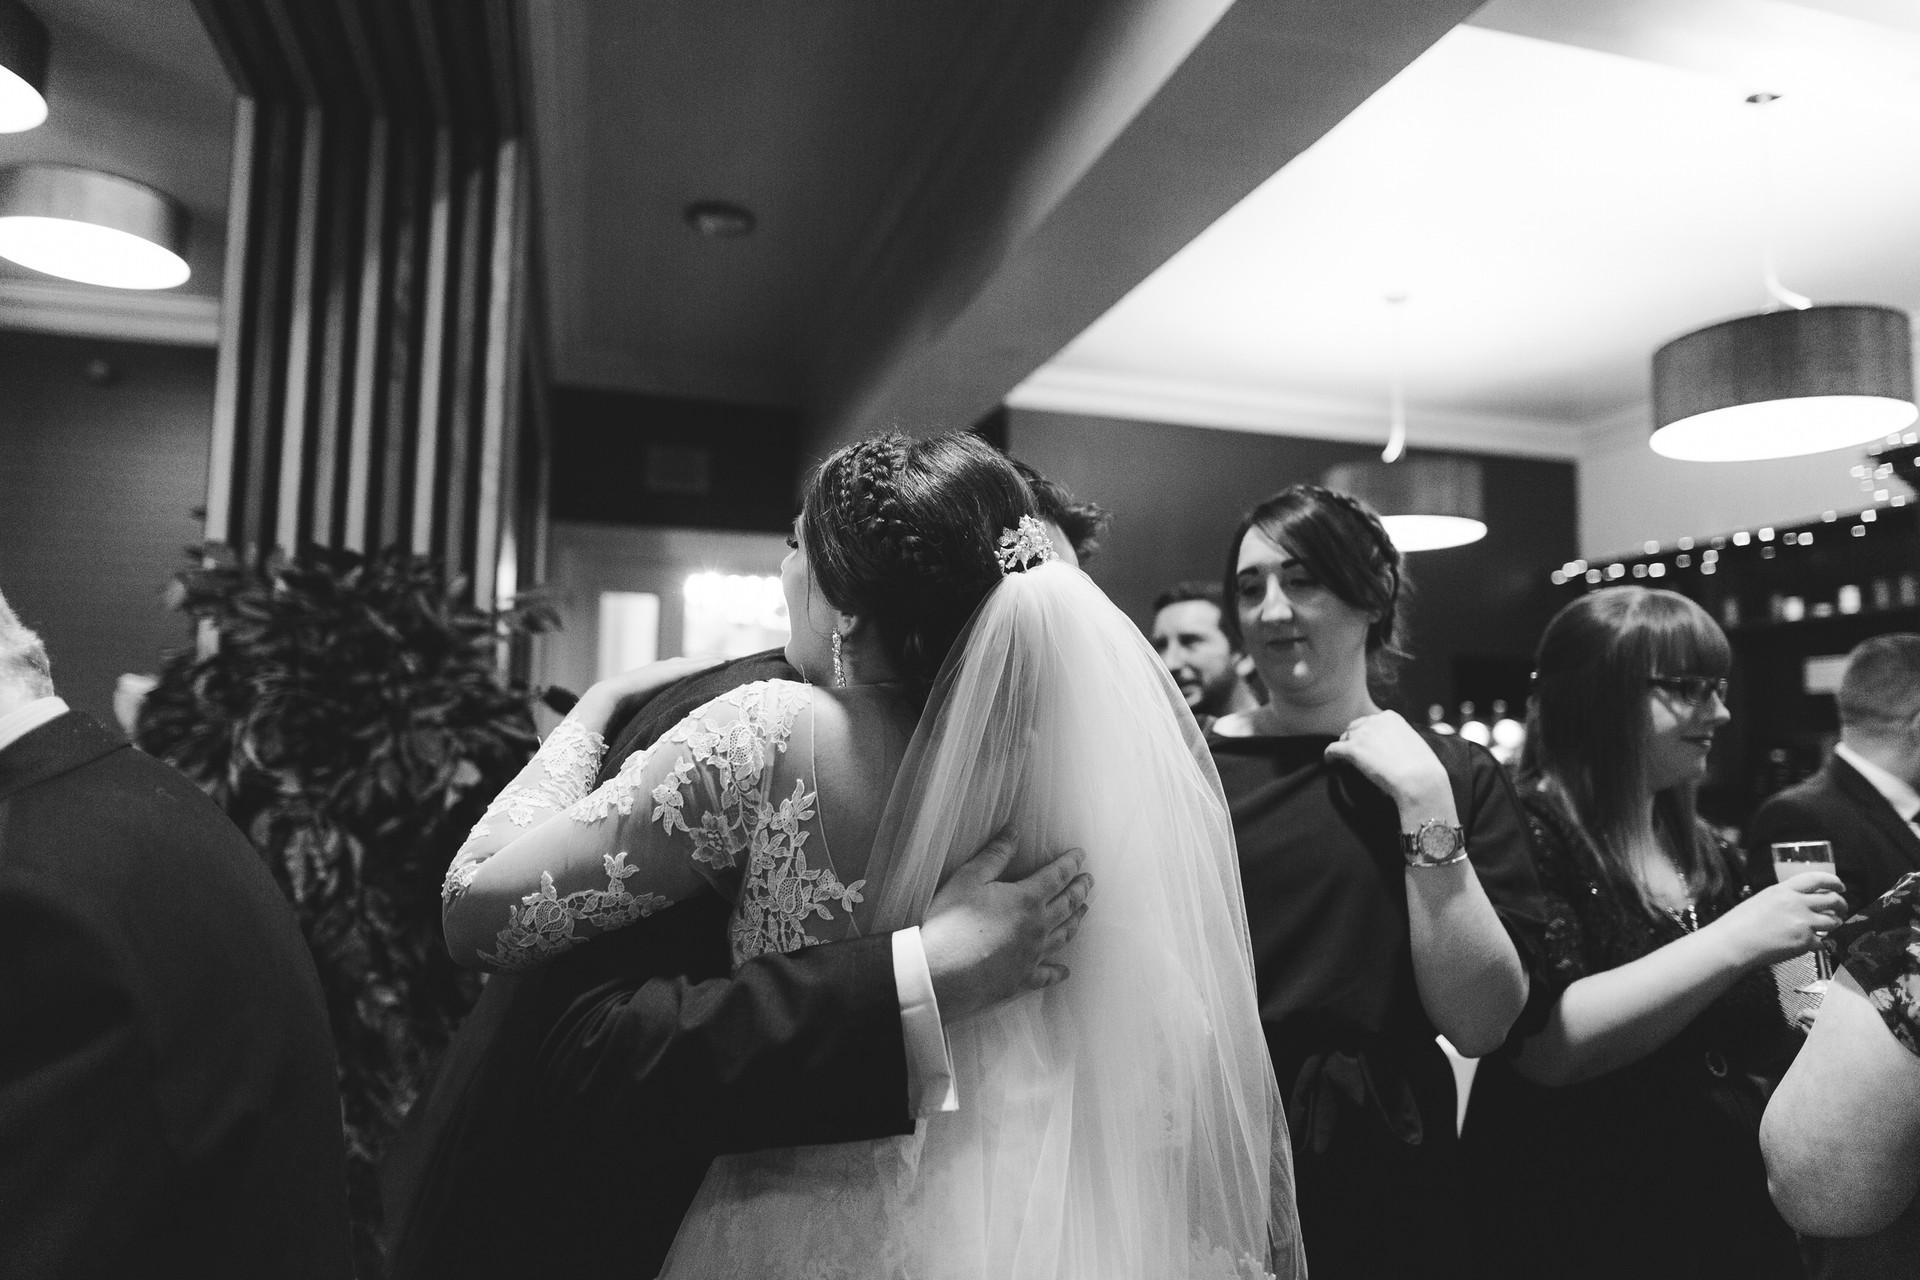 ilkley-west-yorkshire-wedding-138.jpg